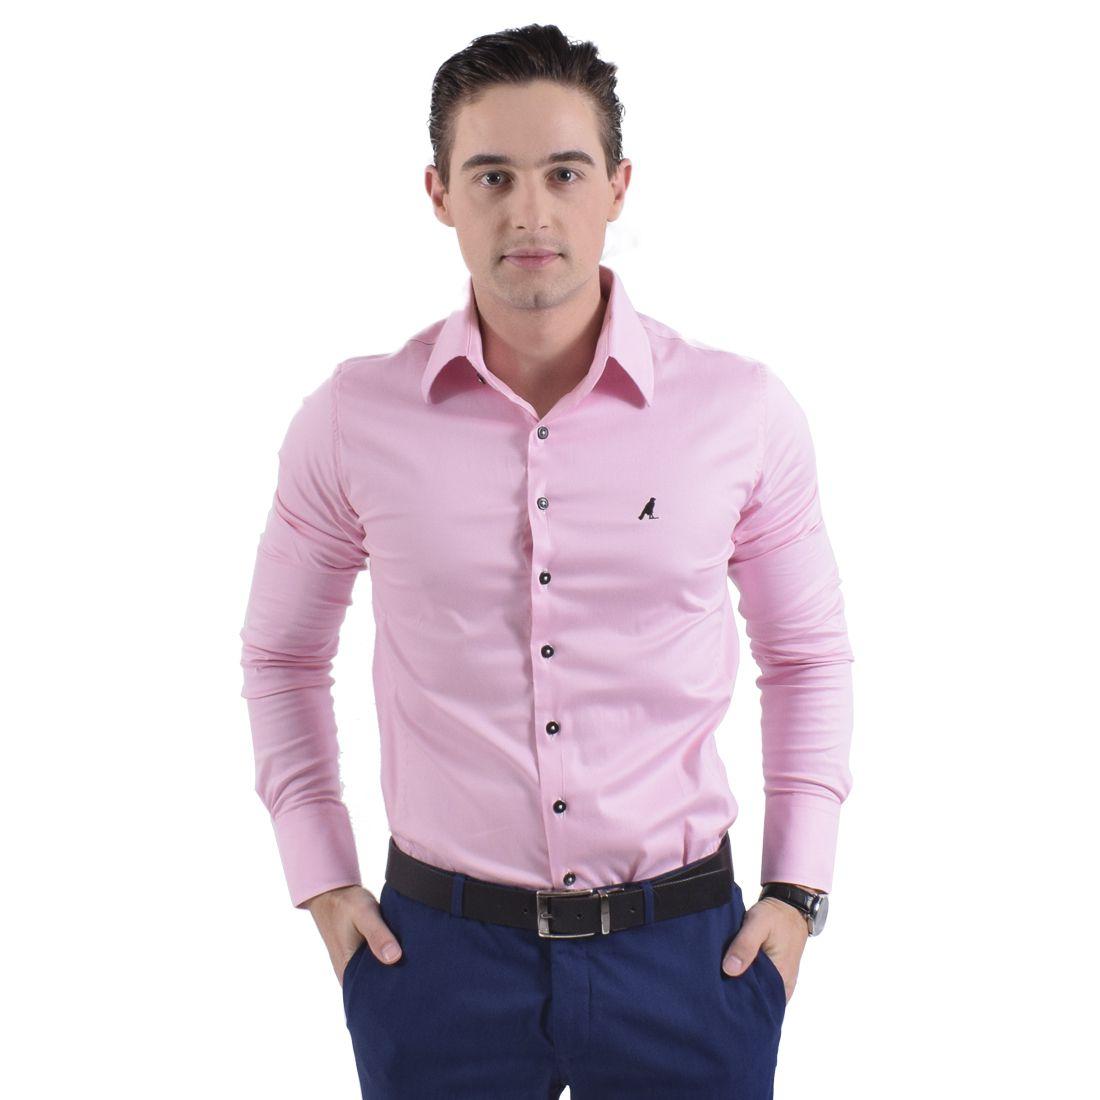 Camisa Social Rosa Masculina Super Slim